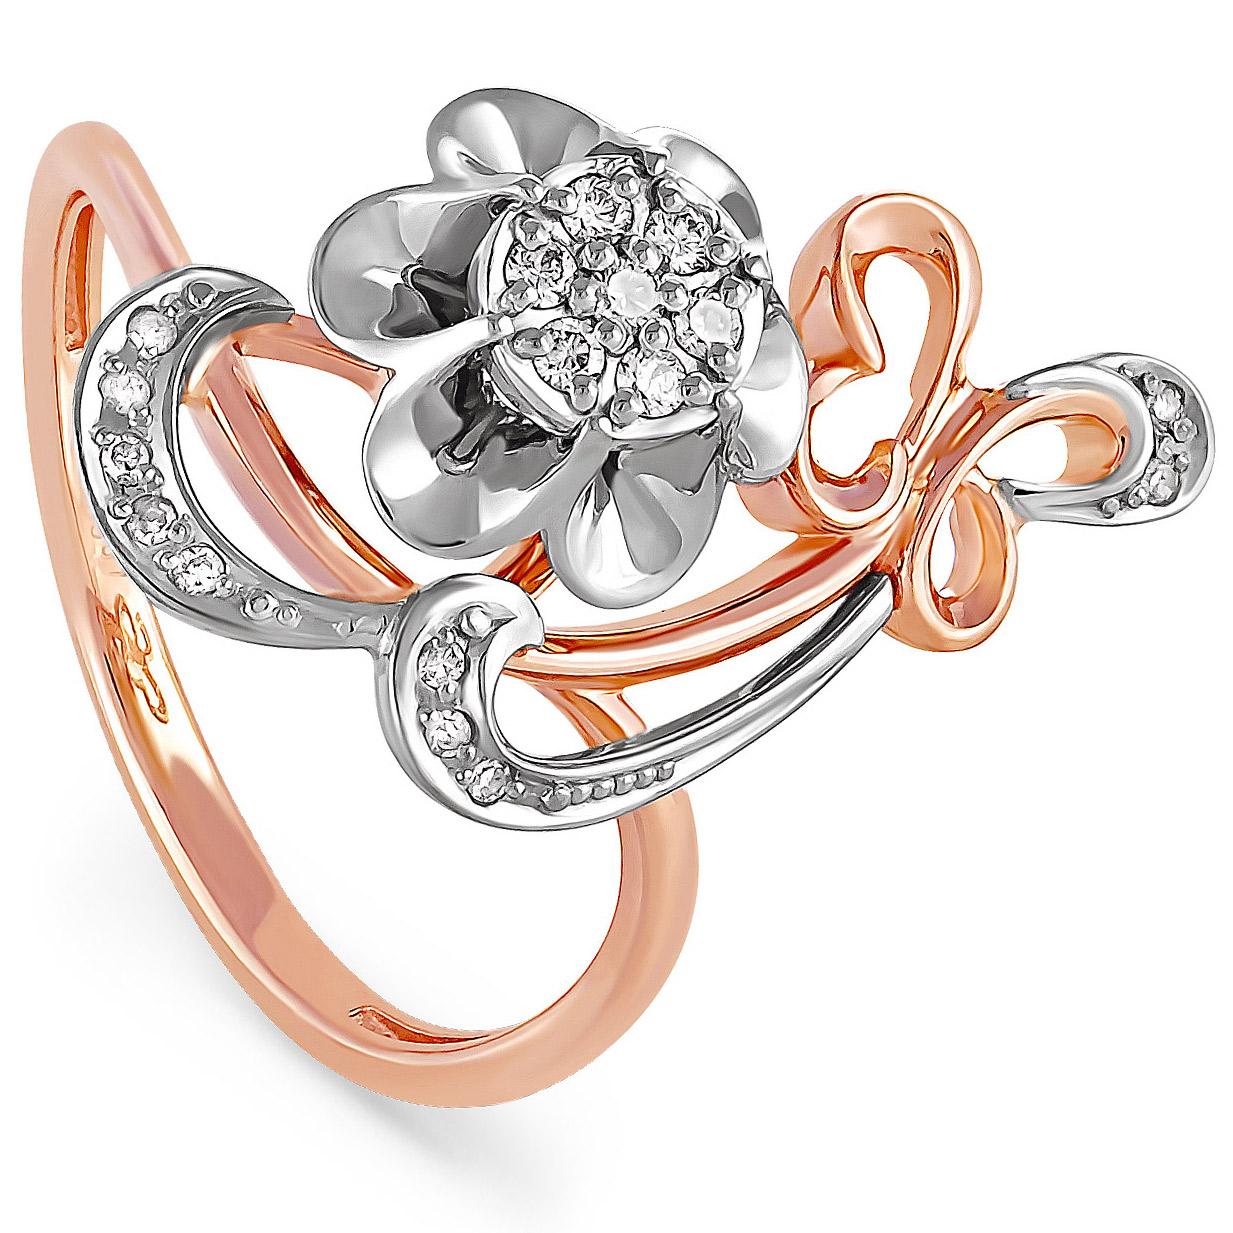 Золотое кольцо Бриллиант арт. 11-0350-1000 11-0350-1000